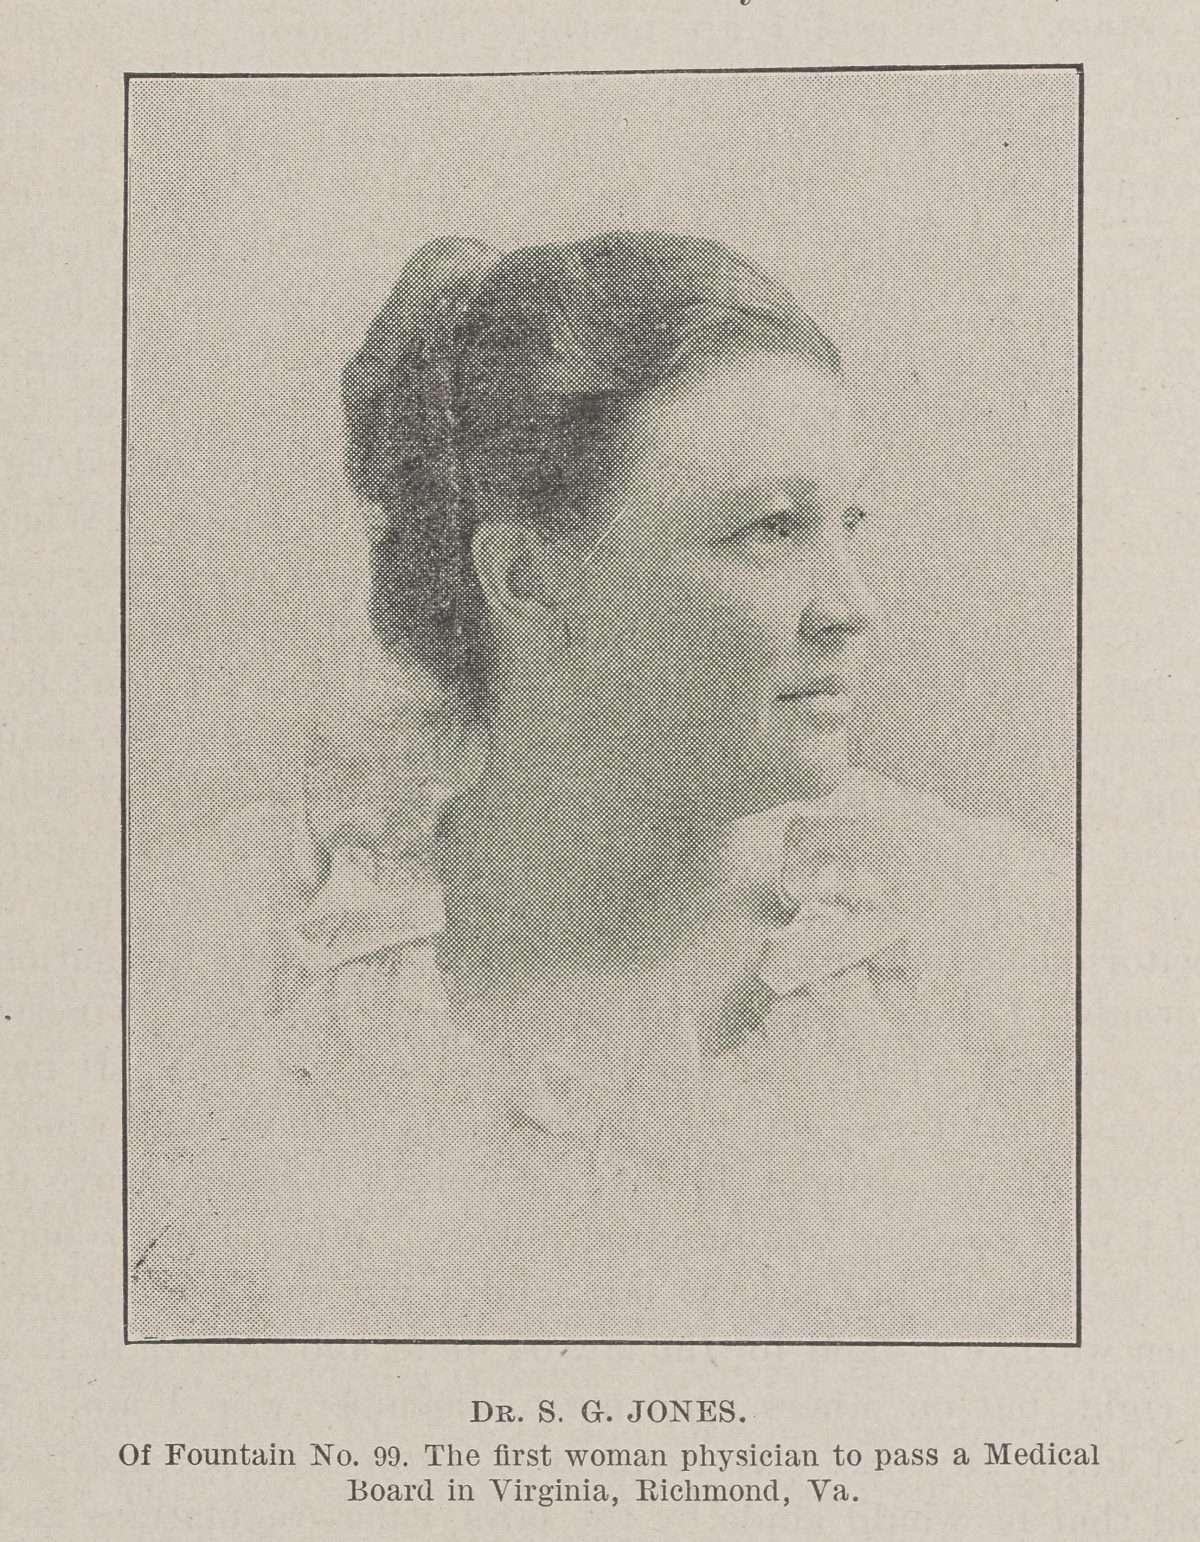 Sarah Garland Boyd Jones